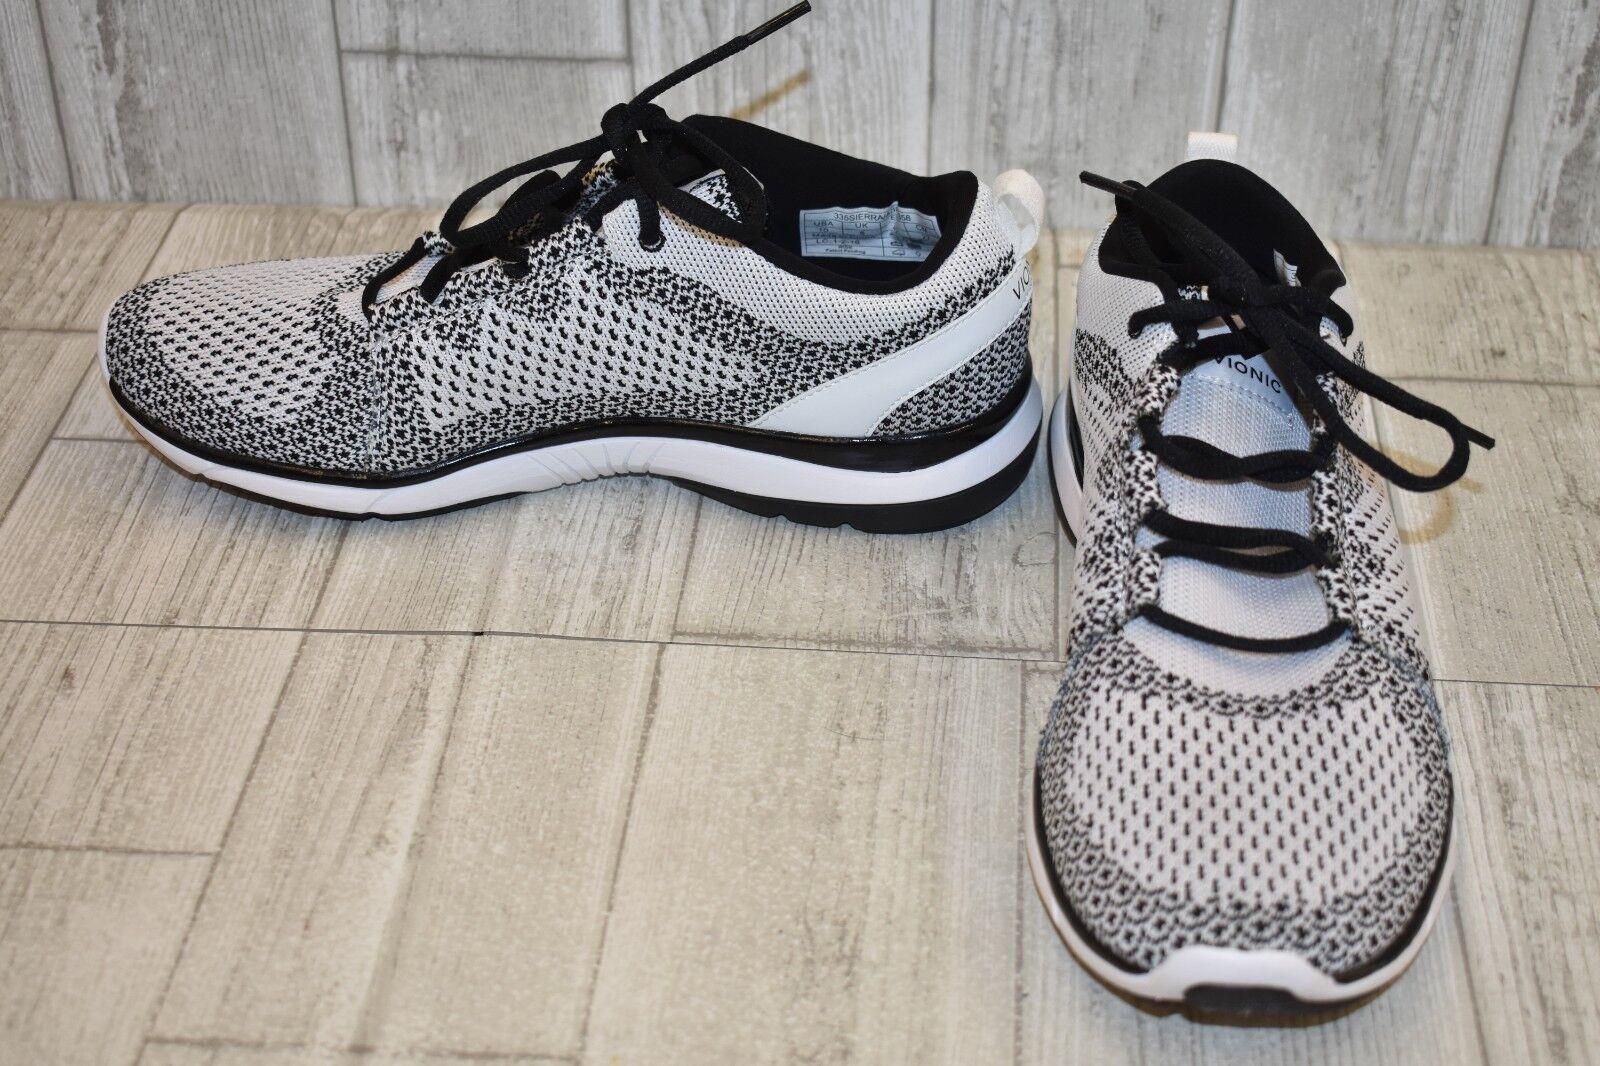 Vionic Flex Sierra Athletic scarpe - Donna    Dimensione 10 - bianca nero 28b7b7